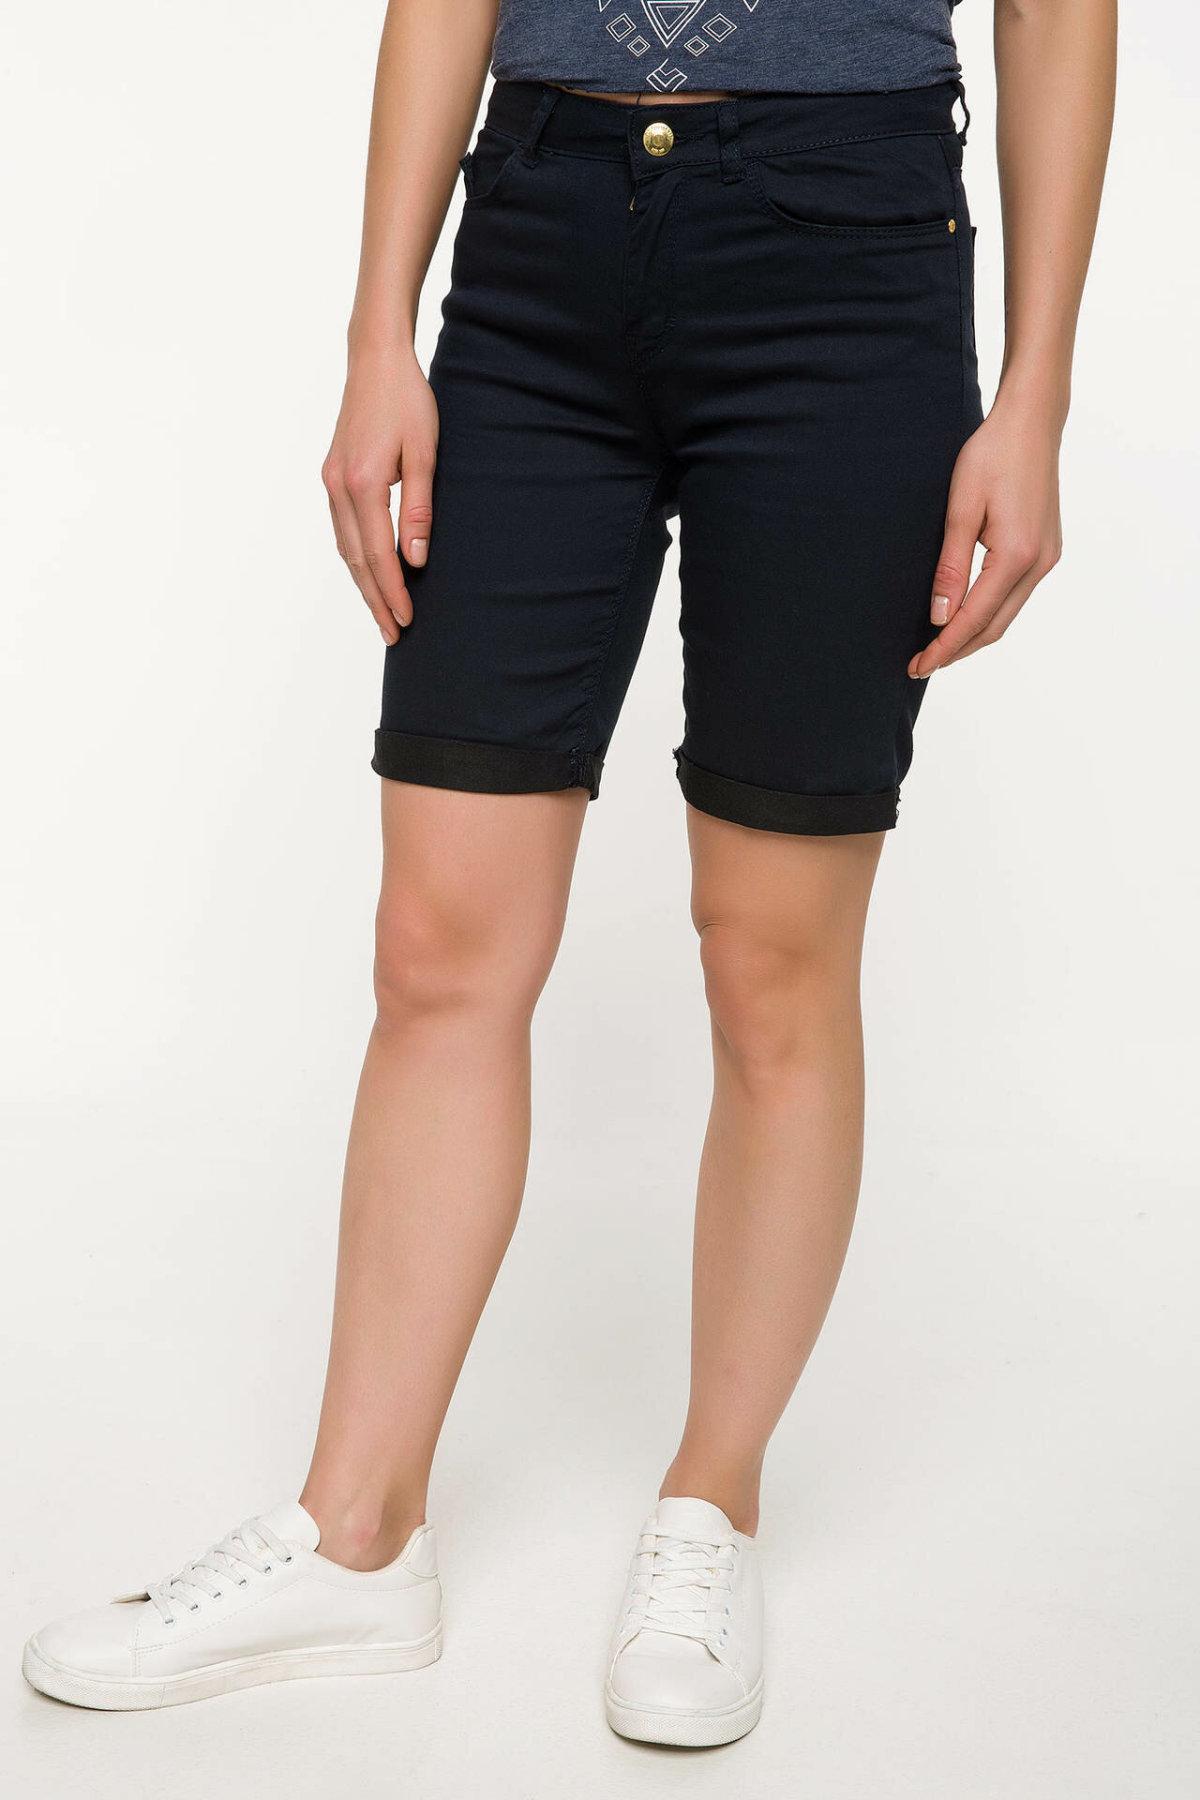 DeFacto Fashion Skinny Pink Casual Mid-waist Shorts Woman Summer Breathable Woven Bottom Short PantsBermuda I4257AZ18SMPN141-I4257AZ18SM